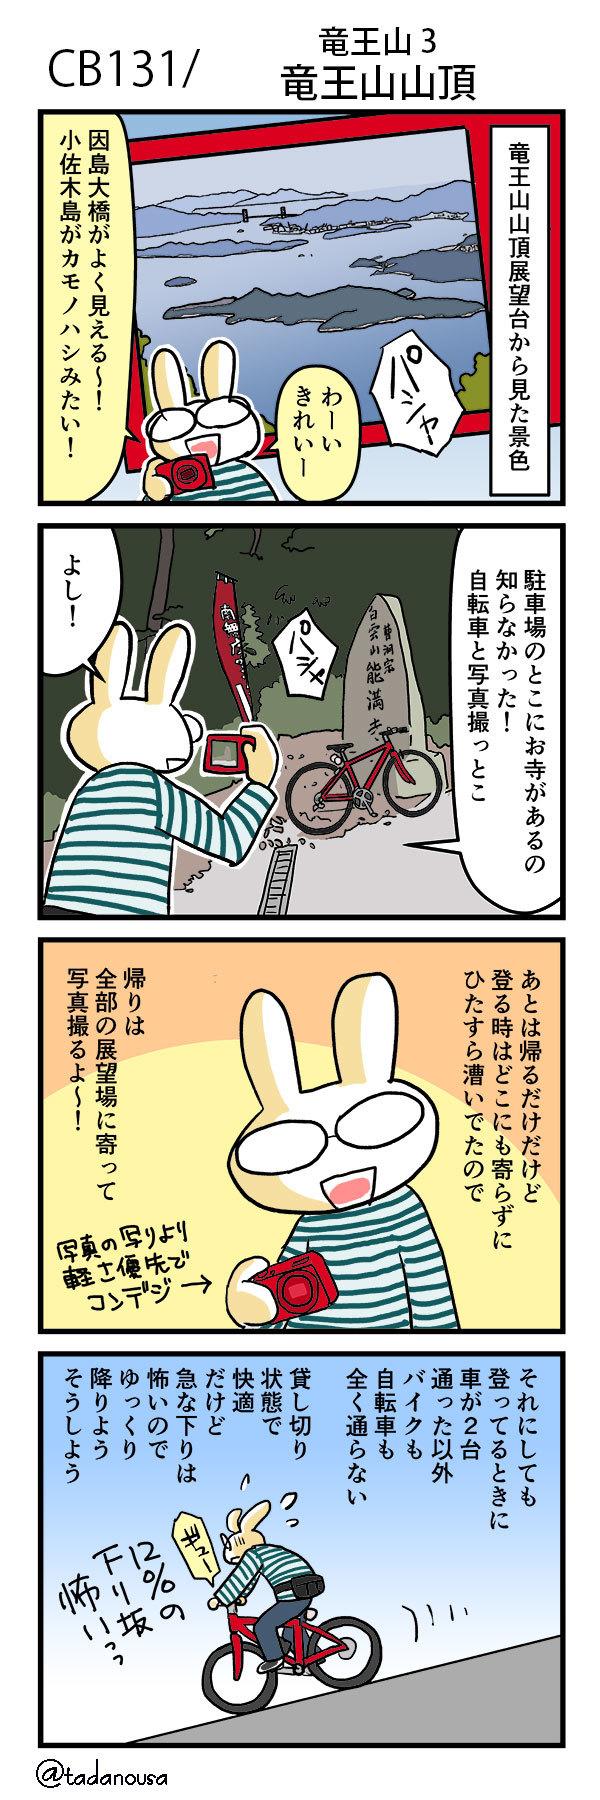 bike_4koma_kako171_s.jpg